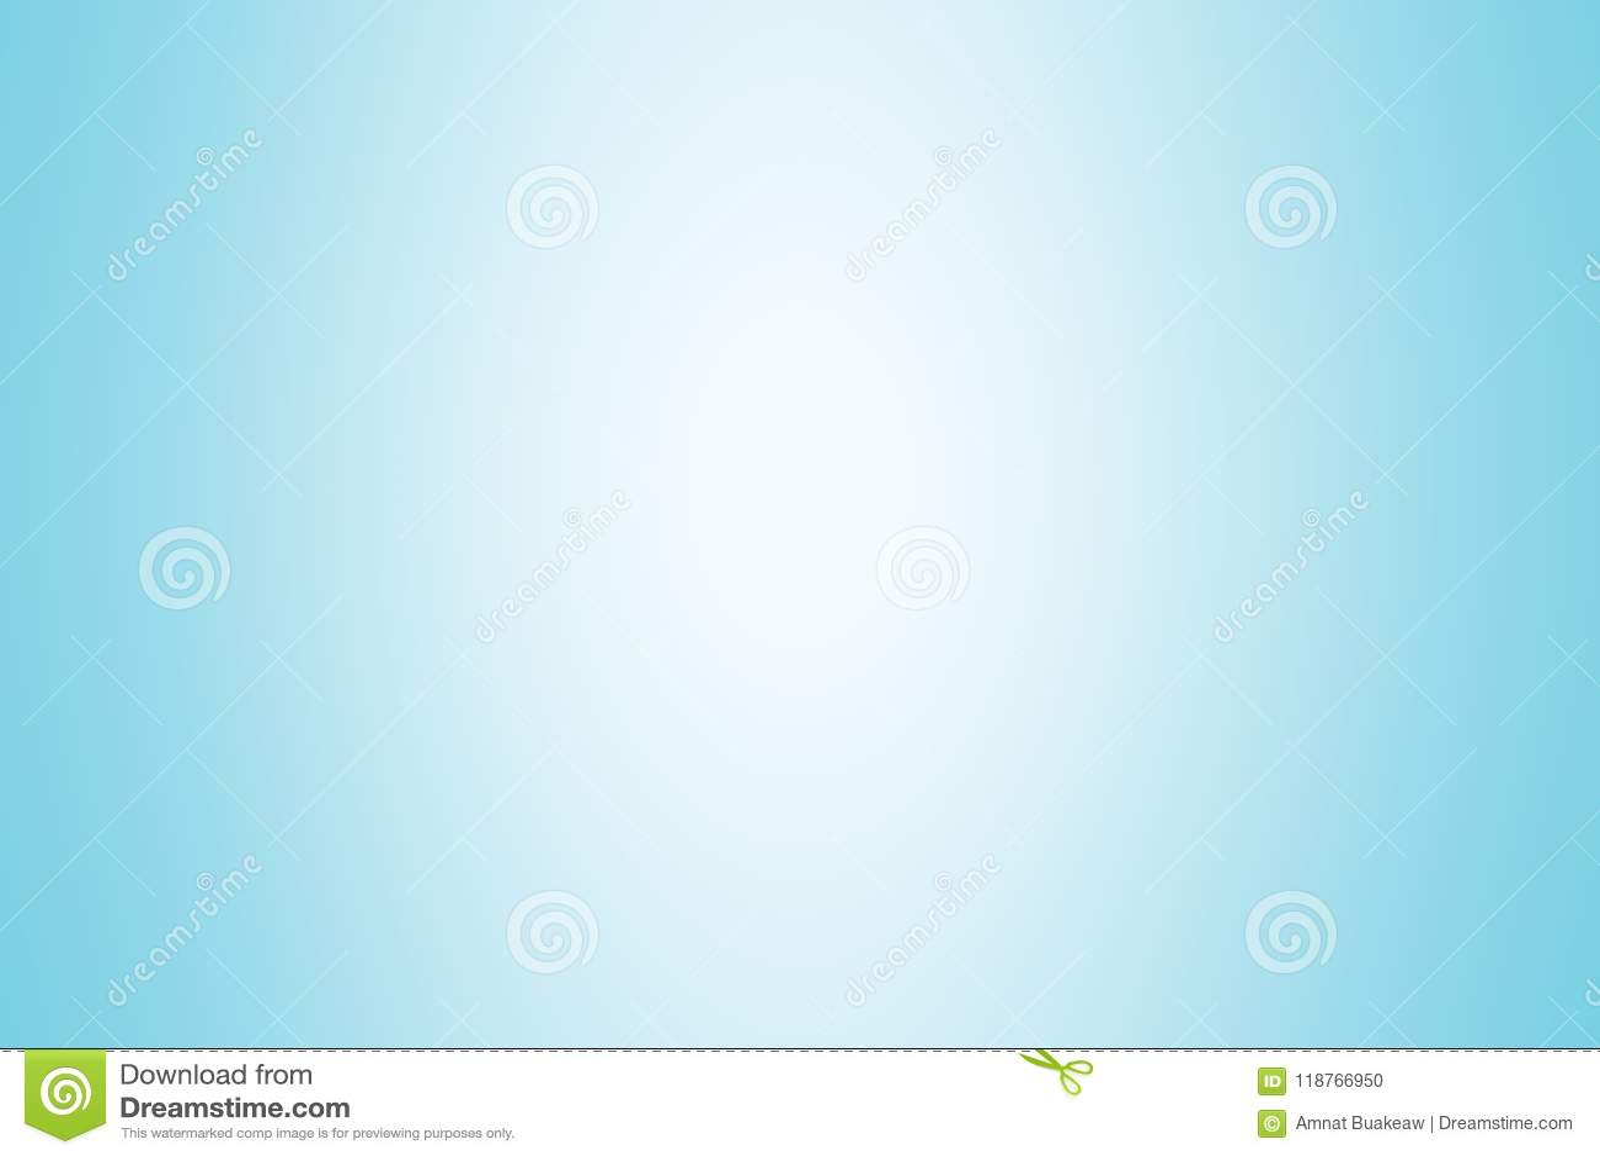 Blauw gradiënt achtergrondkleuren zacht licht, van de het beeldgradiënt van het gradiënt blauw zacht helder behang mooi, blauw de